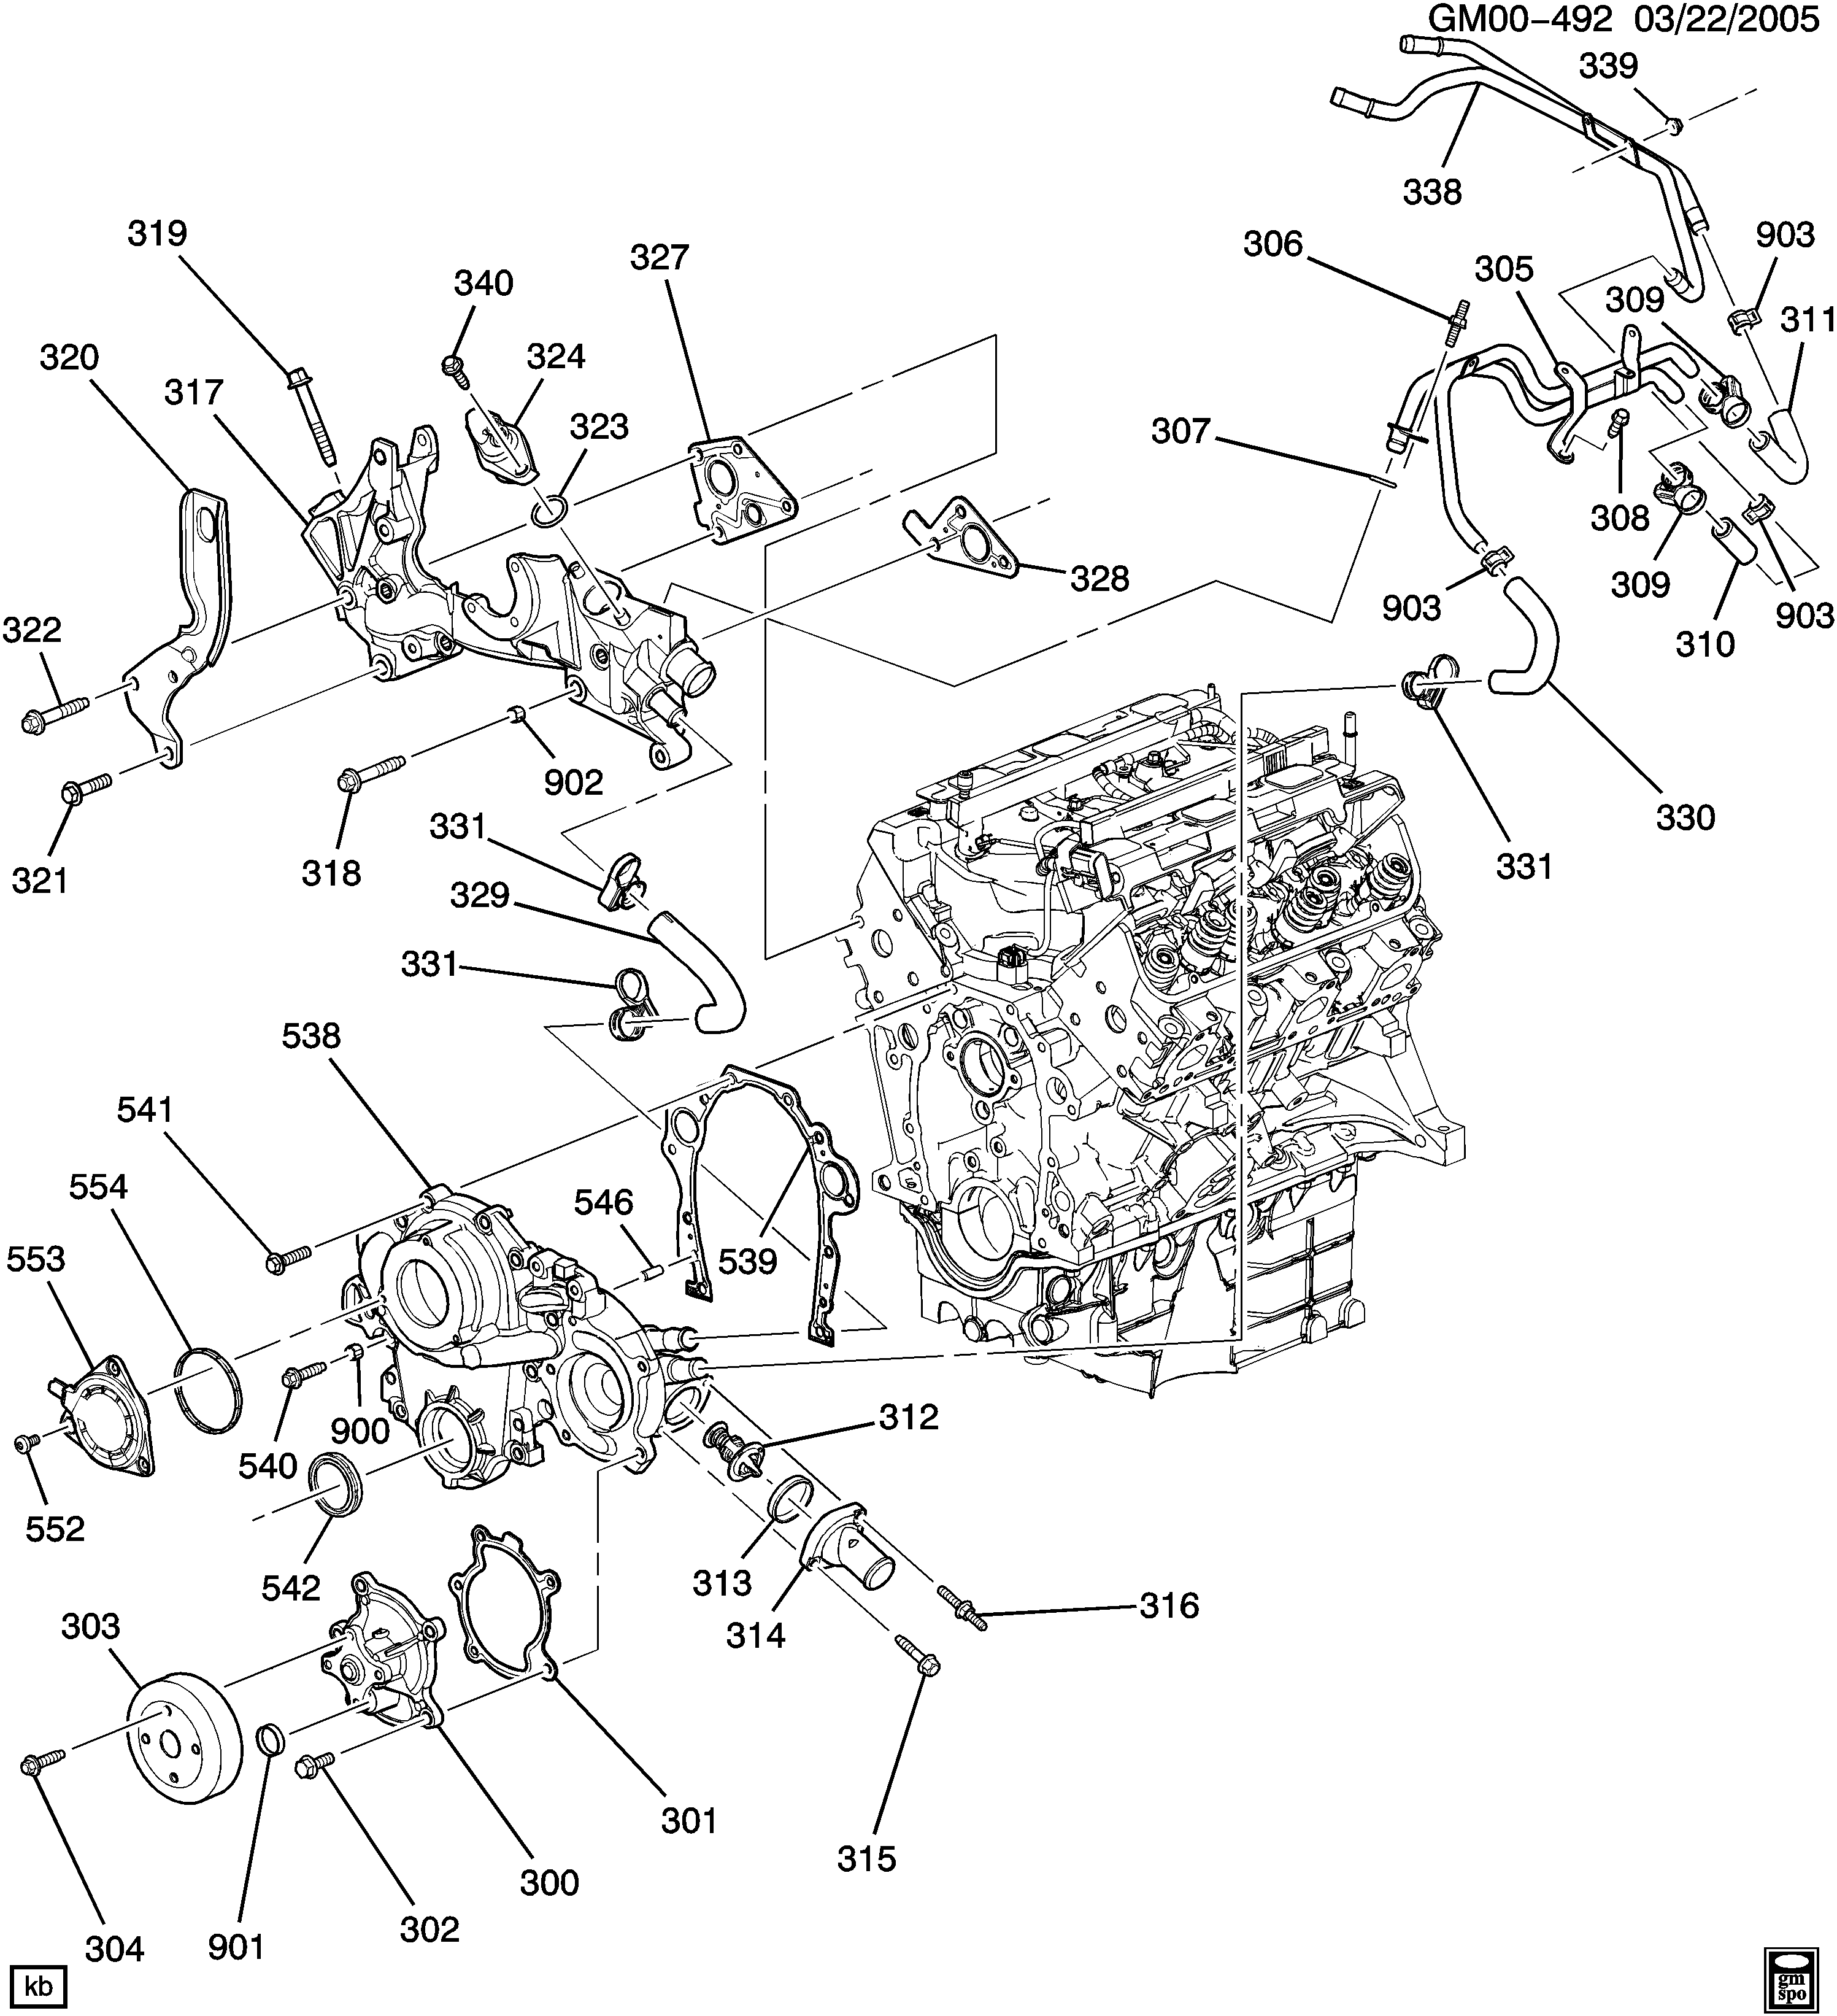 dodge 3 9l v6 engine diagram wiring diagram g11 Dakota V6 Engine